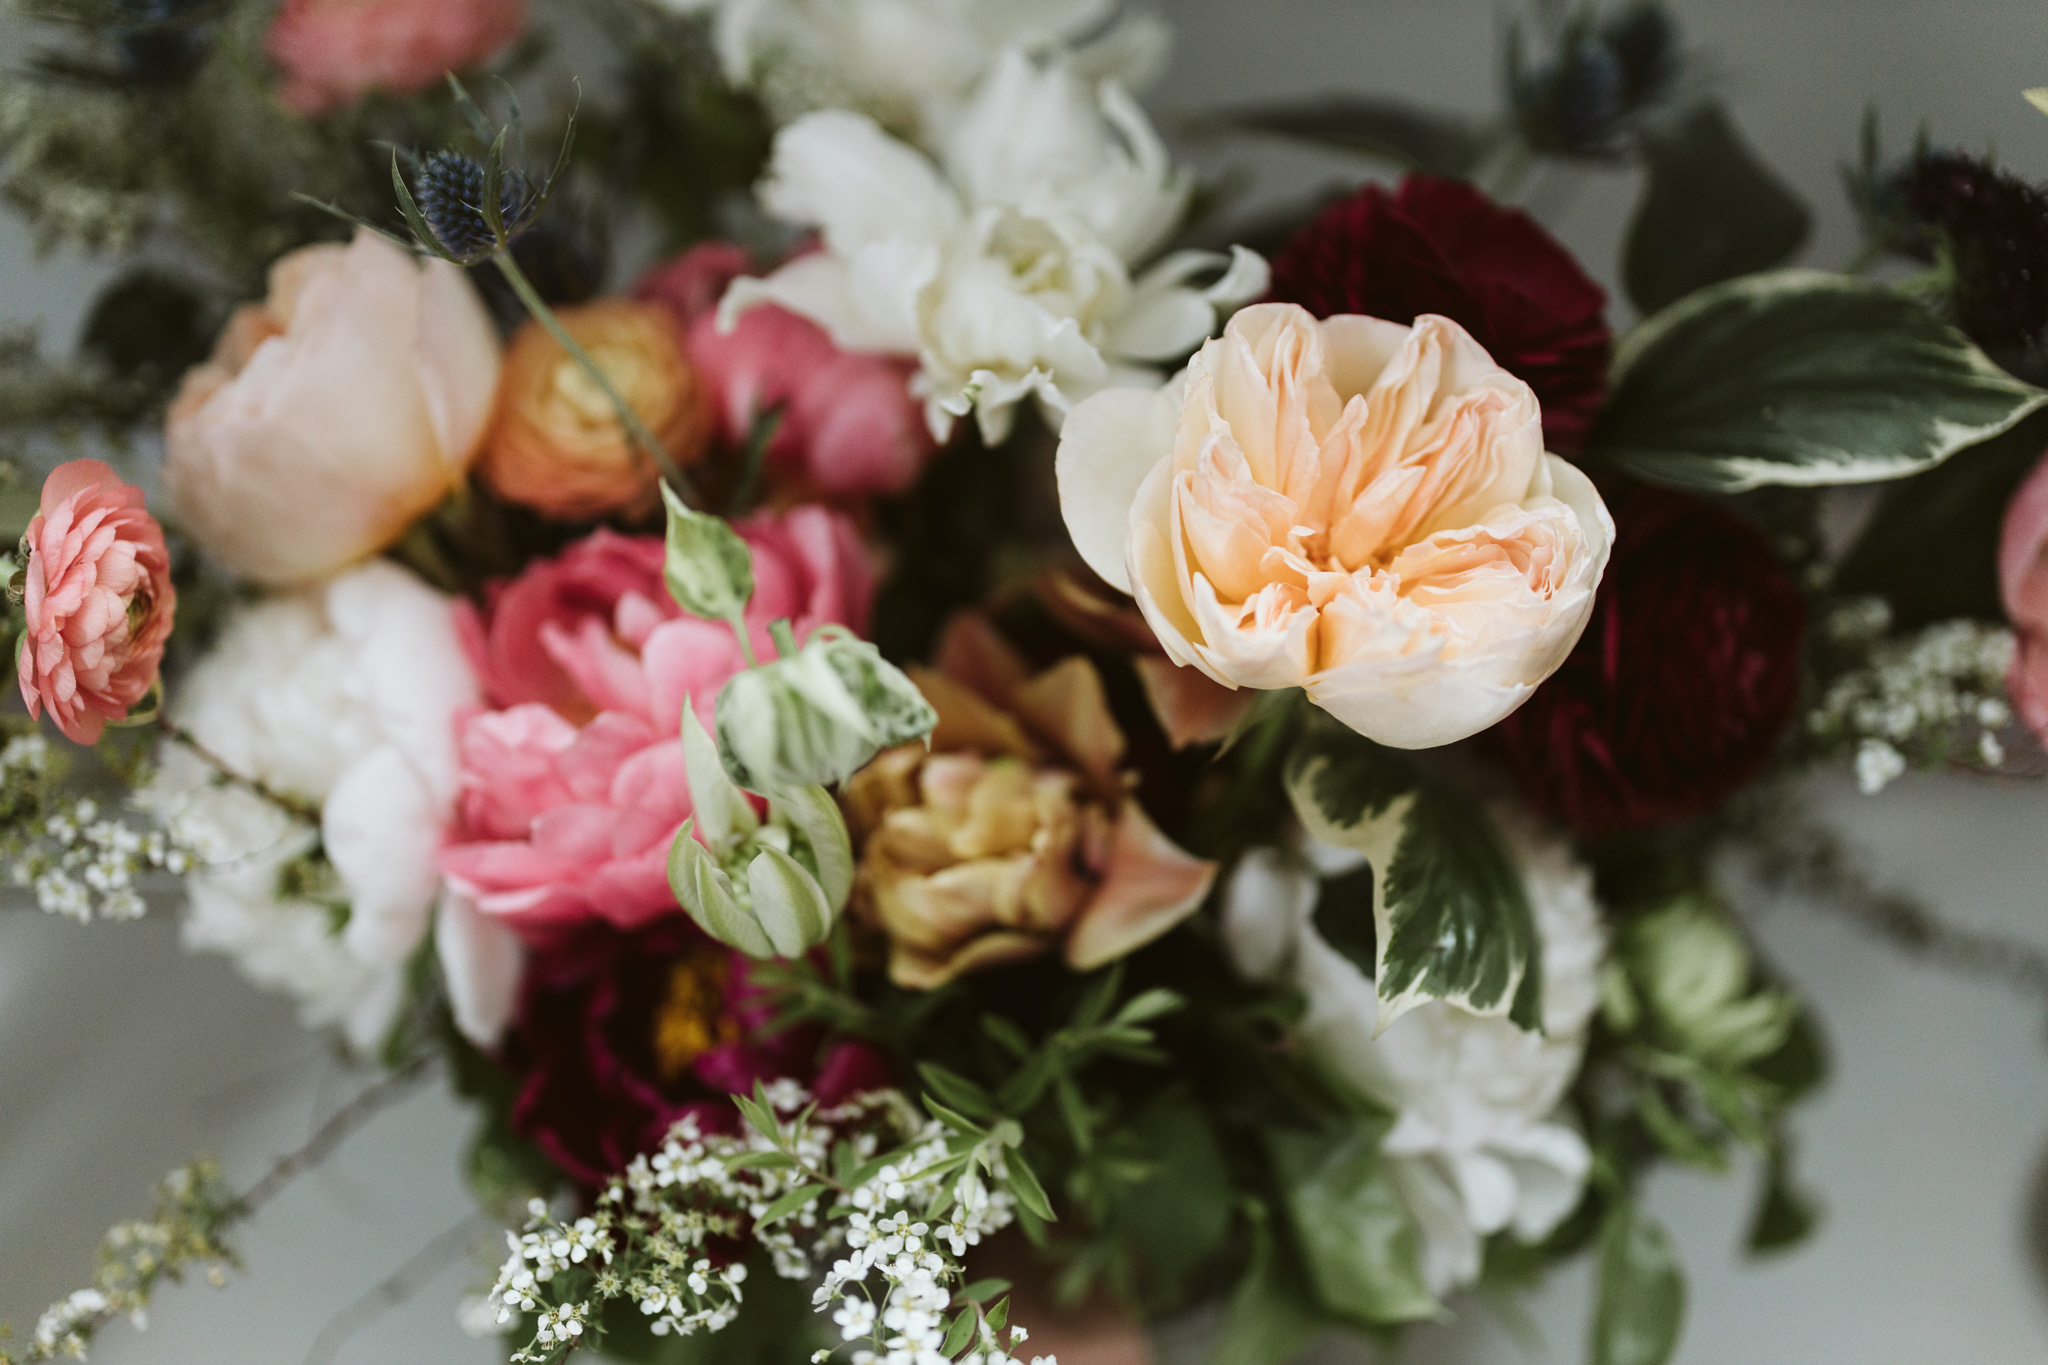 Olive_and_June_Florals-2.jpg